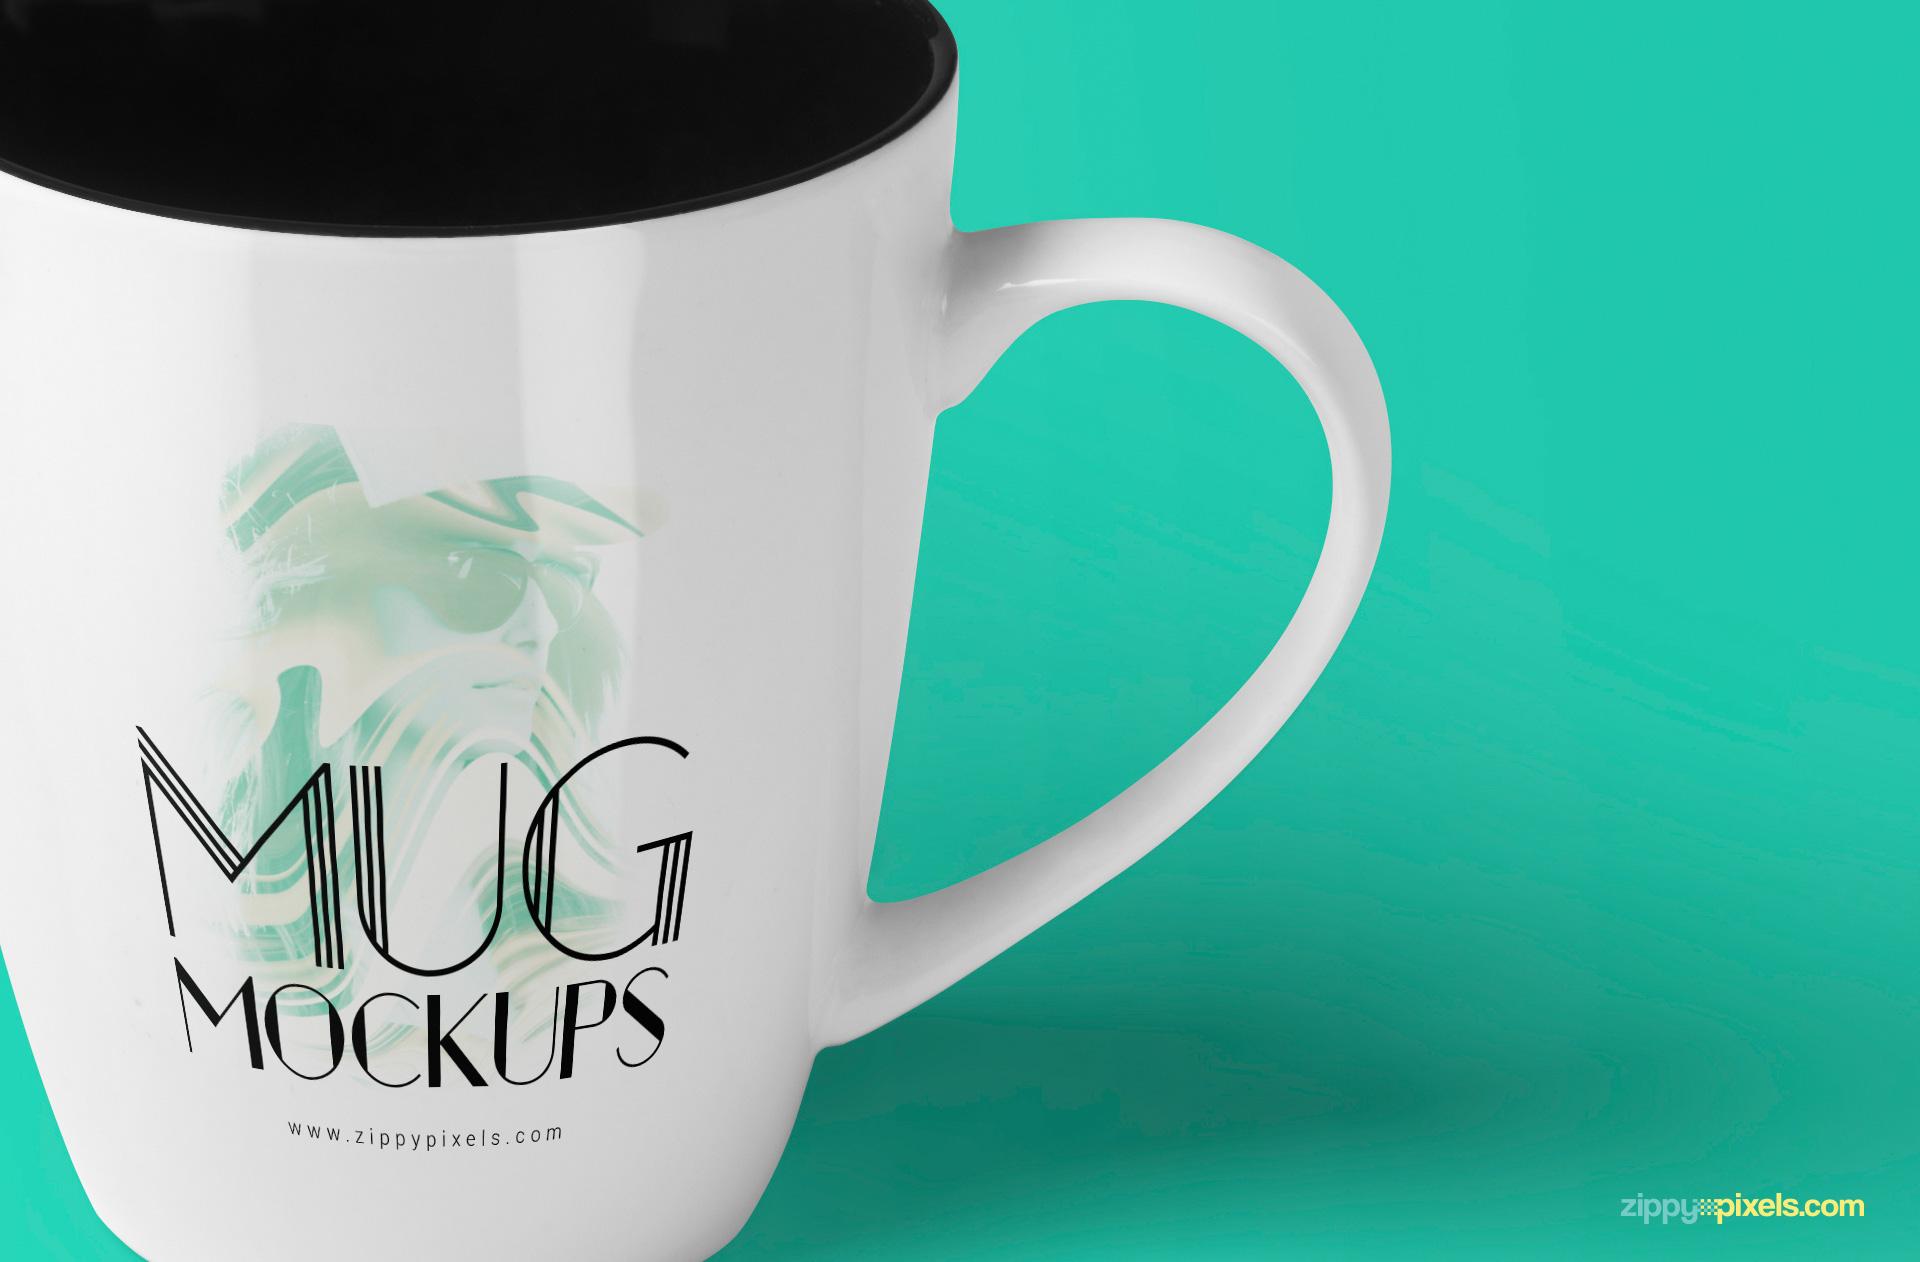 3 free realistic mug mockups in various perspectives